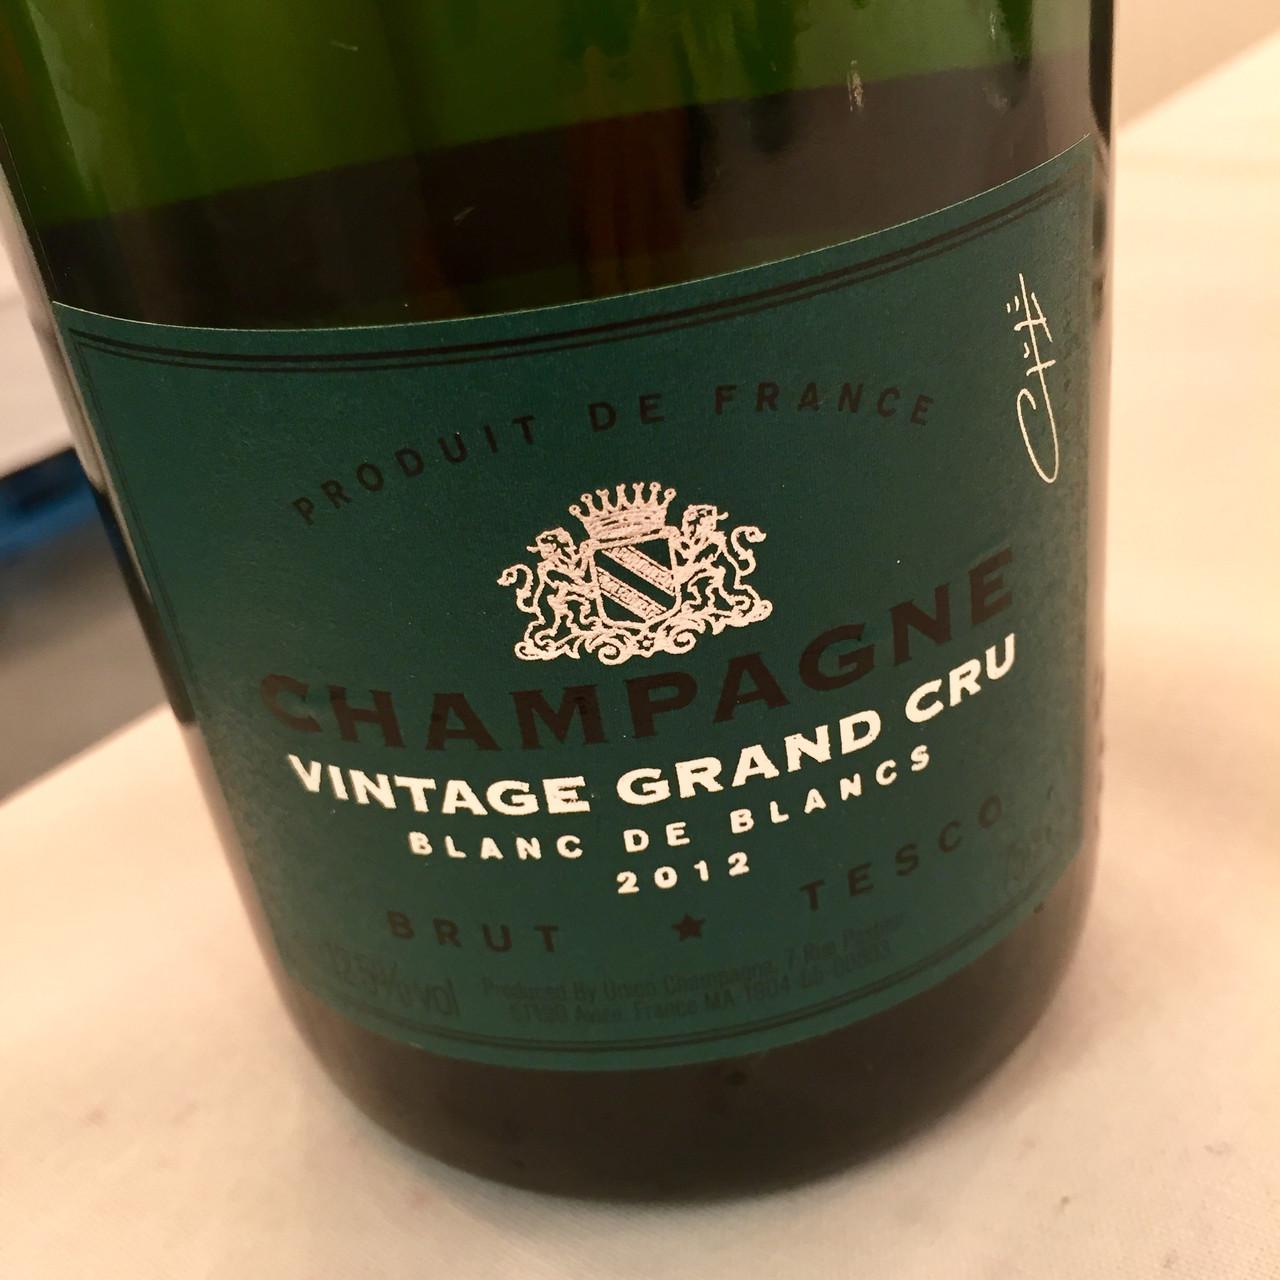 Tesco Vintage Grand Cru and Piper-Heidsieck Champagnes